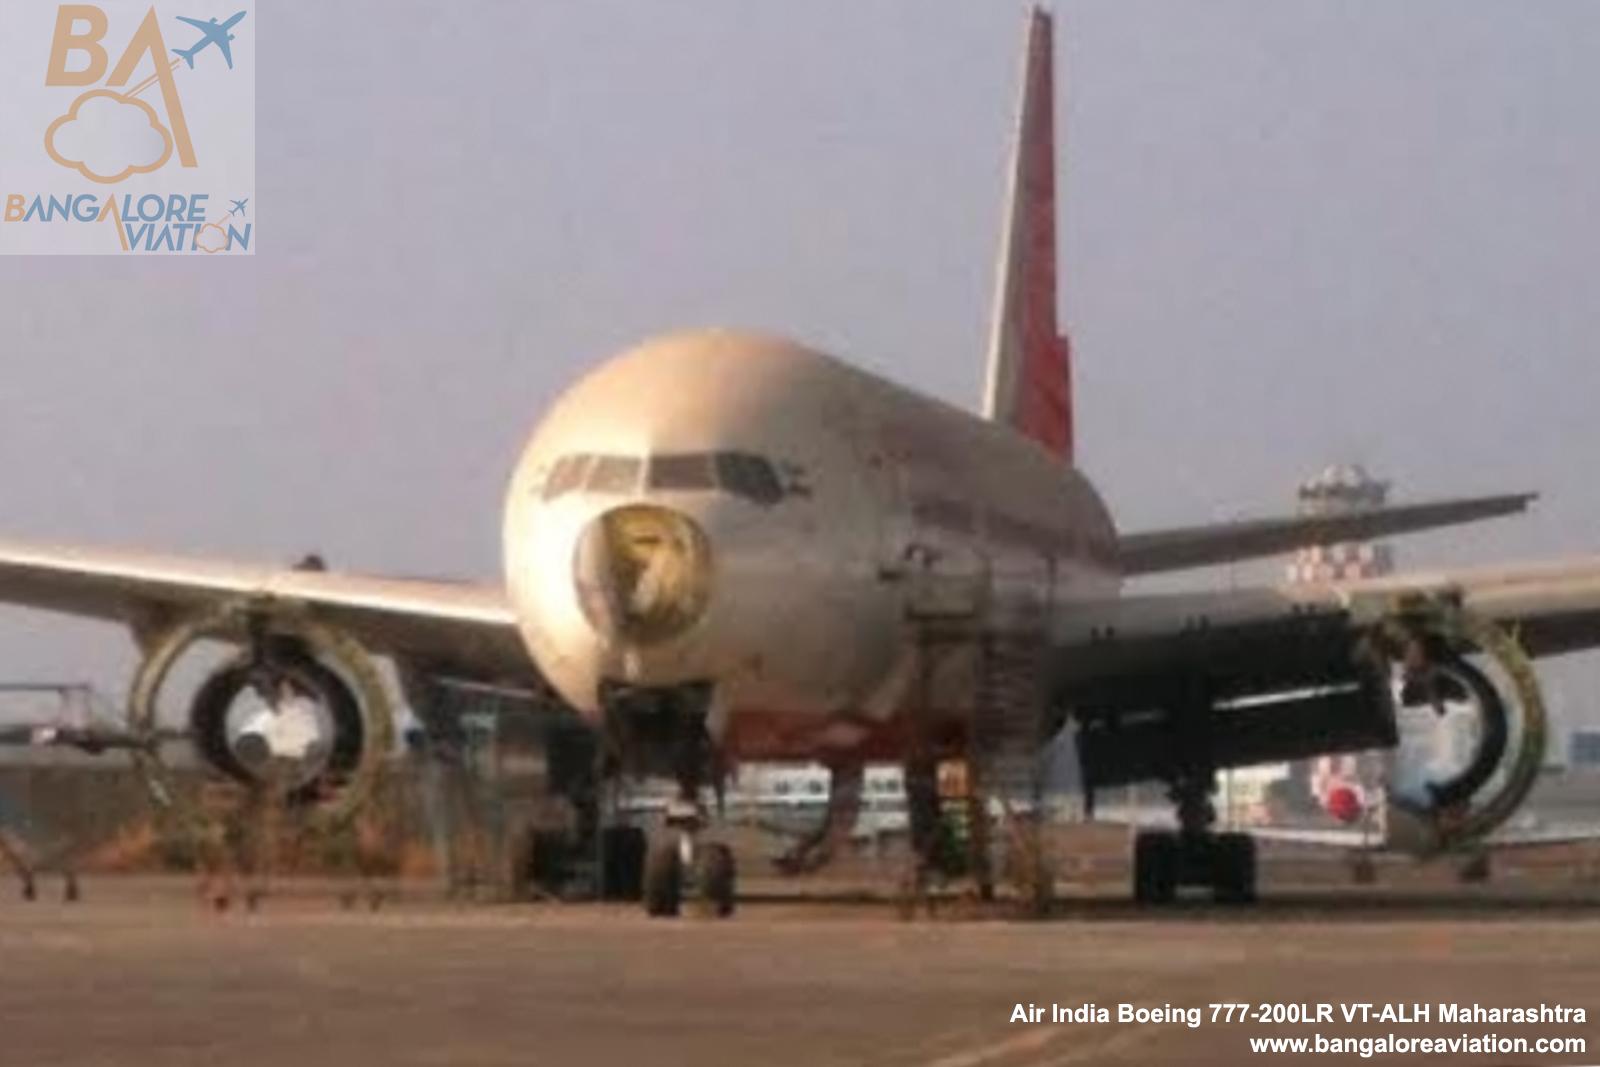 http://www.bangaloreaviation.com/wp-content/uploads/2014/03/VT-ALH_Maharashtra_Cannibalised_Air_India_Boeing_777-200LR_1.jpg